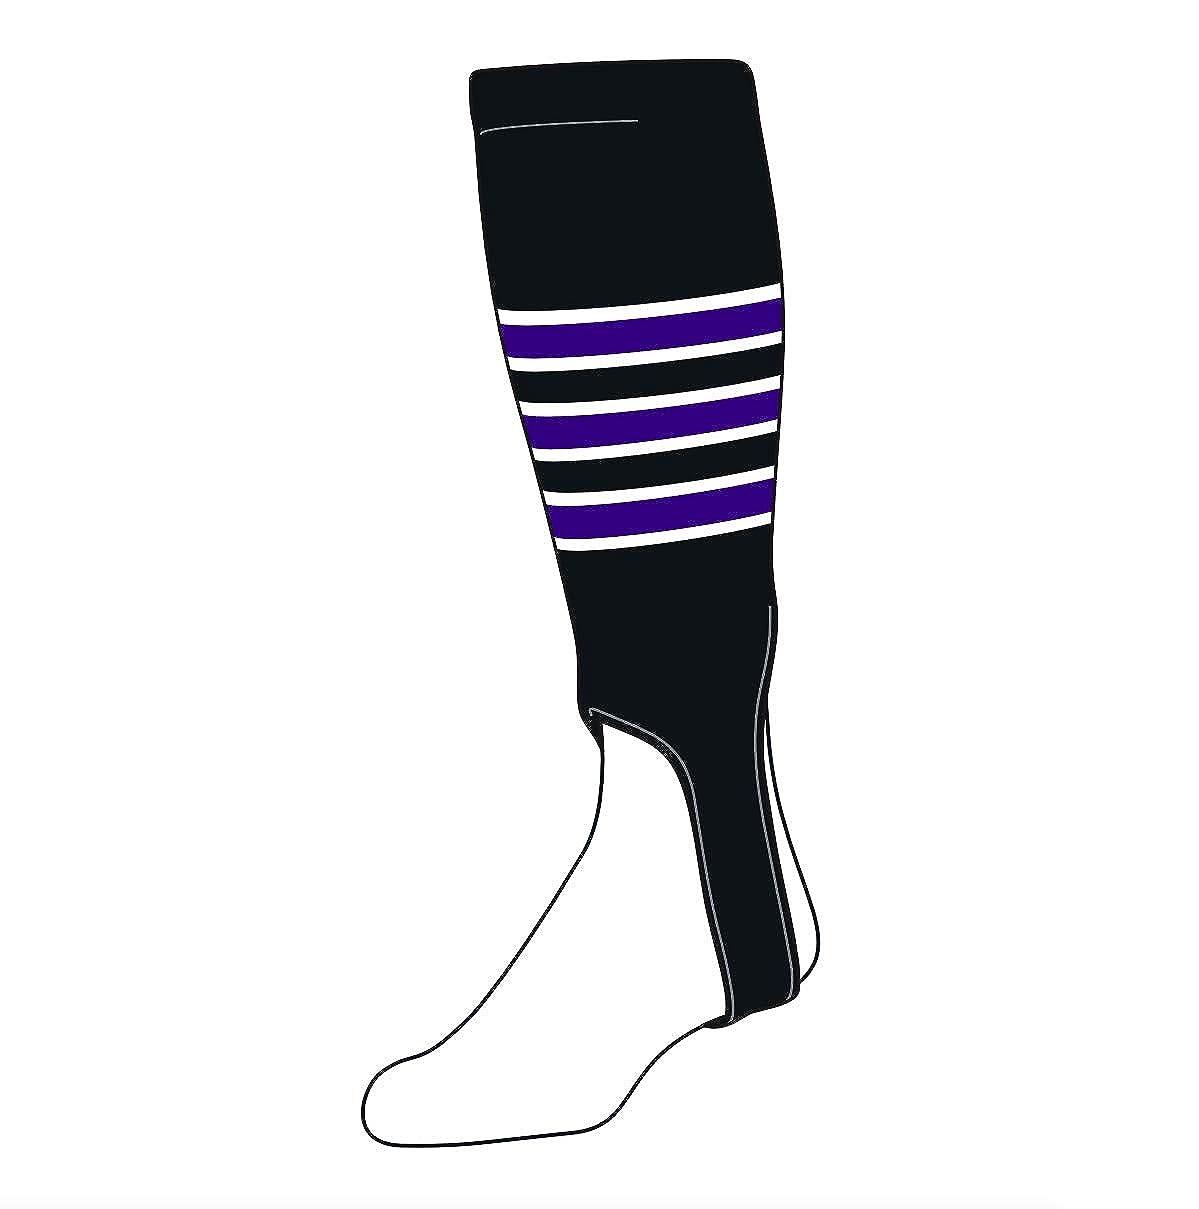 TCK 19 Socks SOCKSHOSIERY メンズ US サイズ: Large Large 19 inch サイズ: (16+ years) B07MVLSLHD, ワインマルシェまるやま:be36d2ce --- cgt-tbc.fr